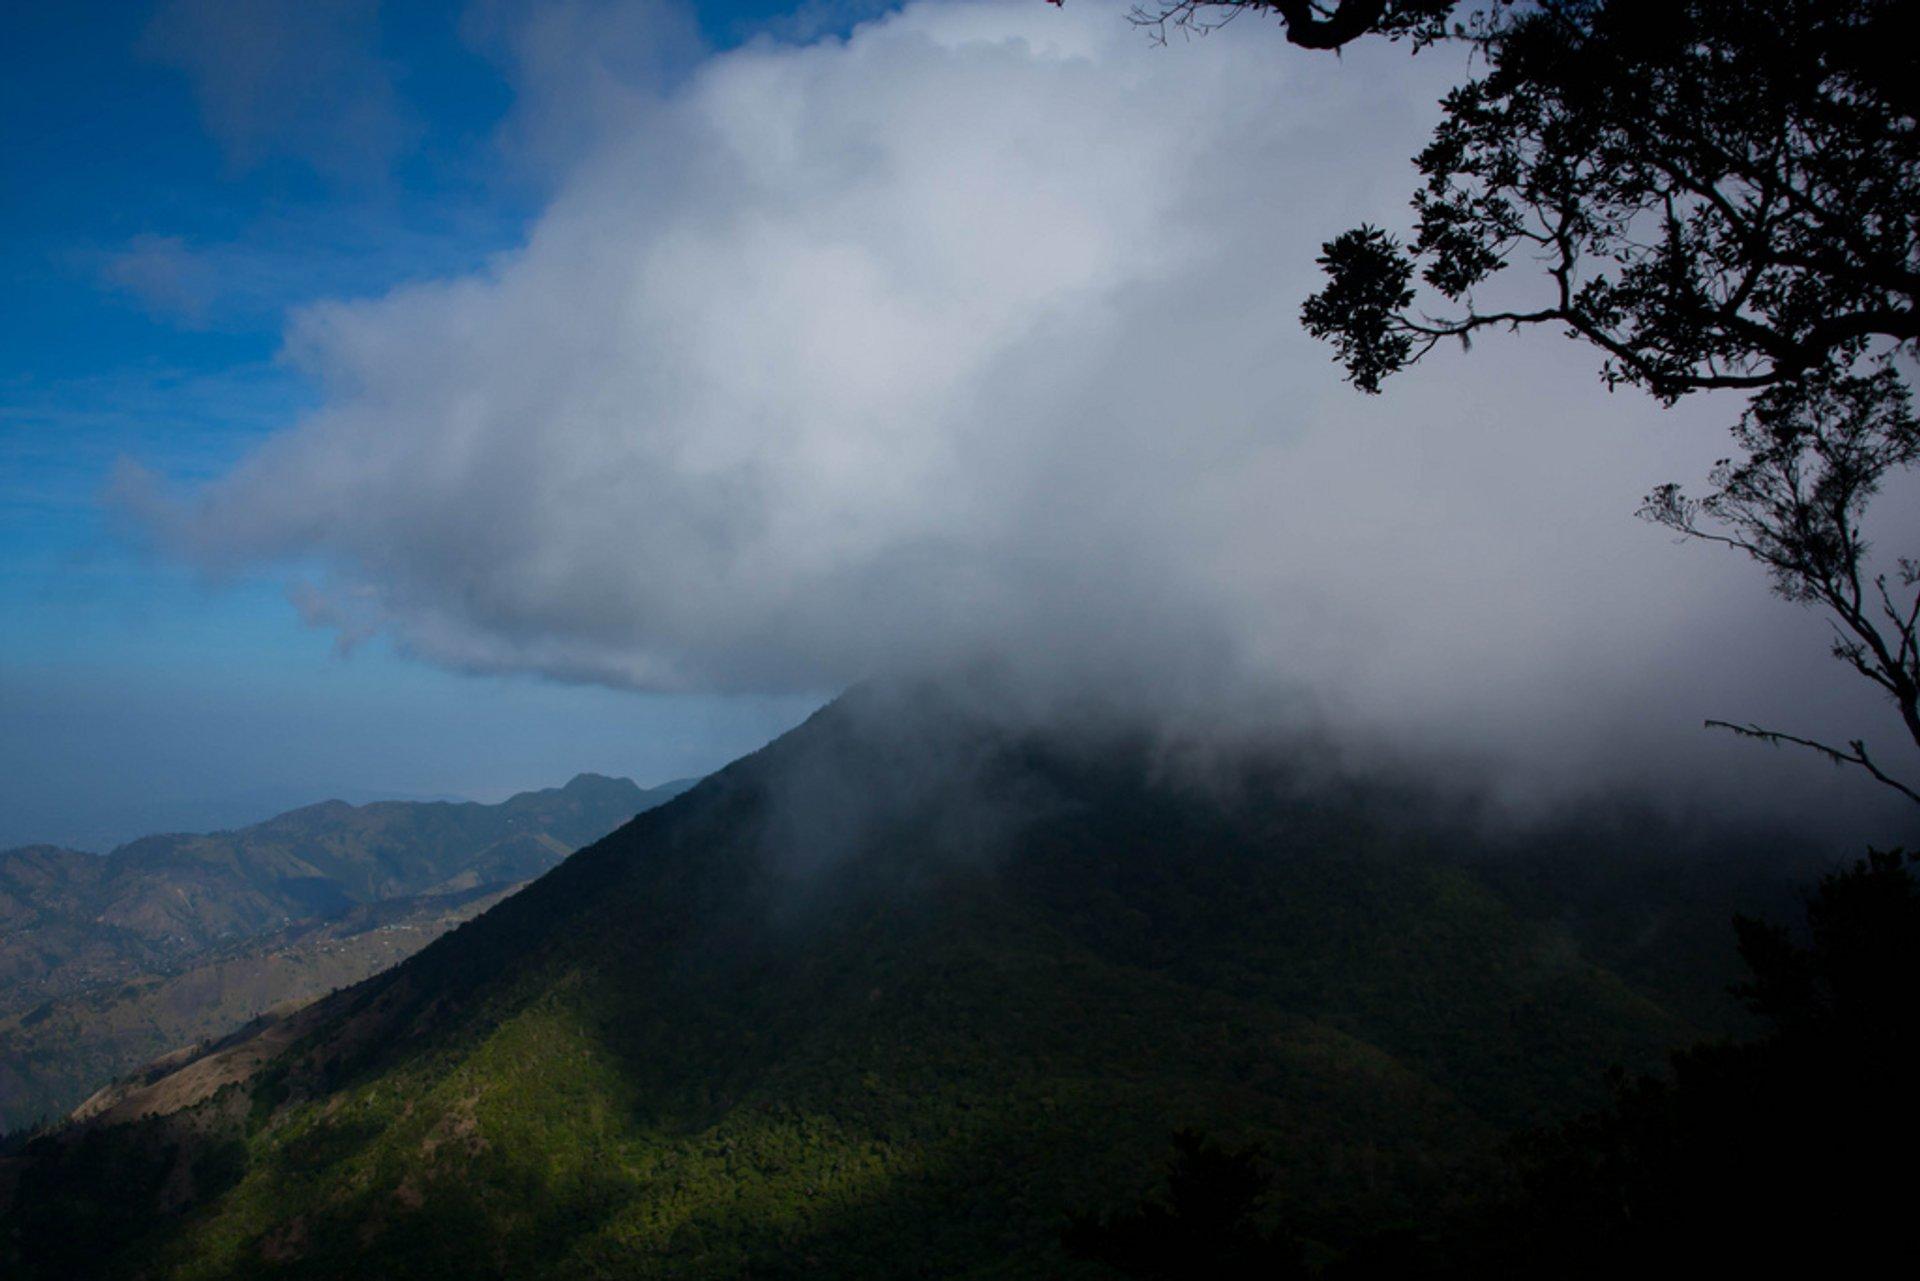 Hiking Blue Mountain Peak in Jamaica - Best Season 2020